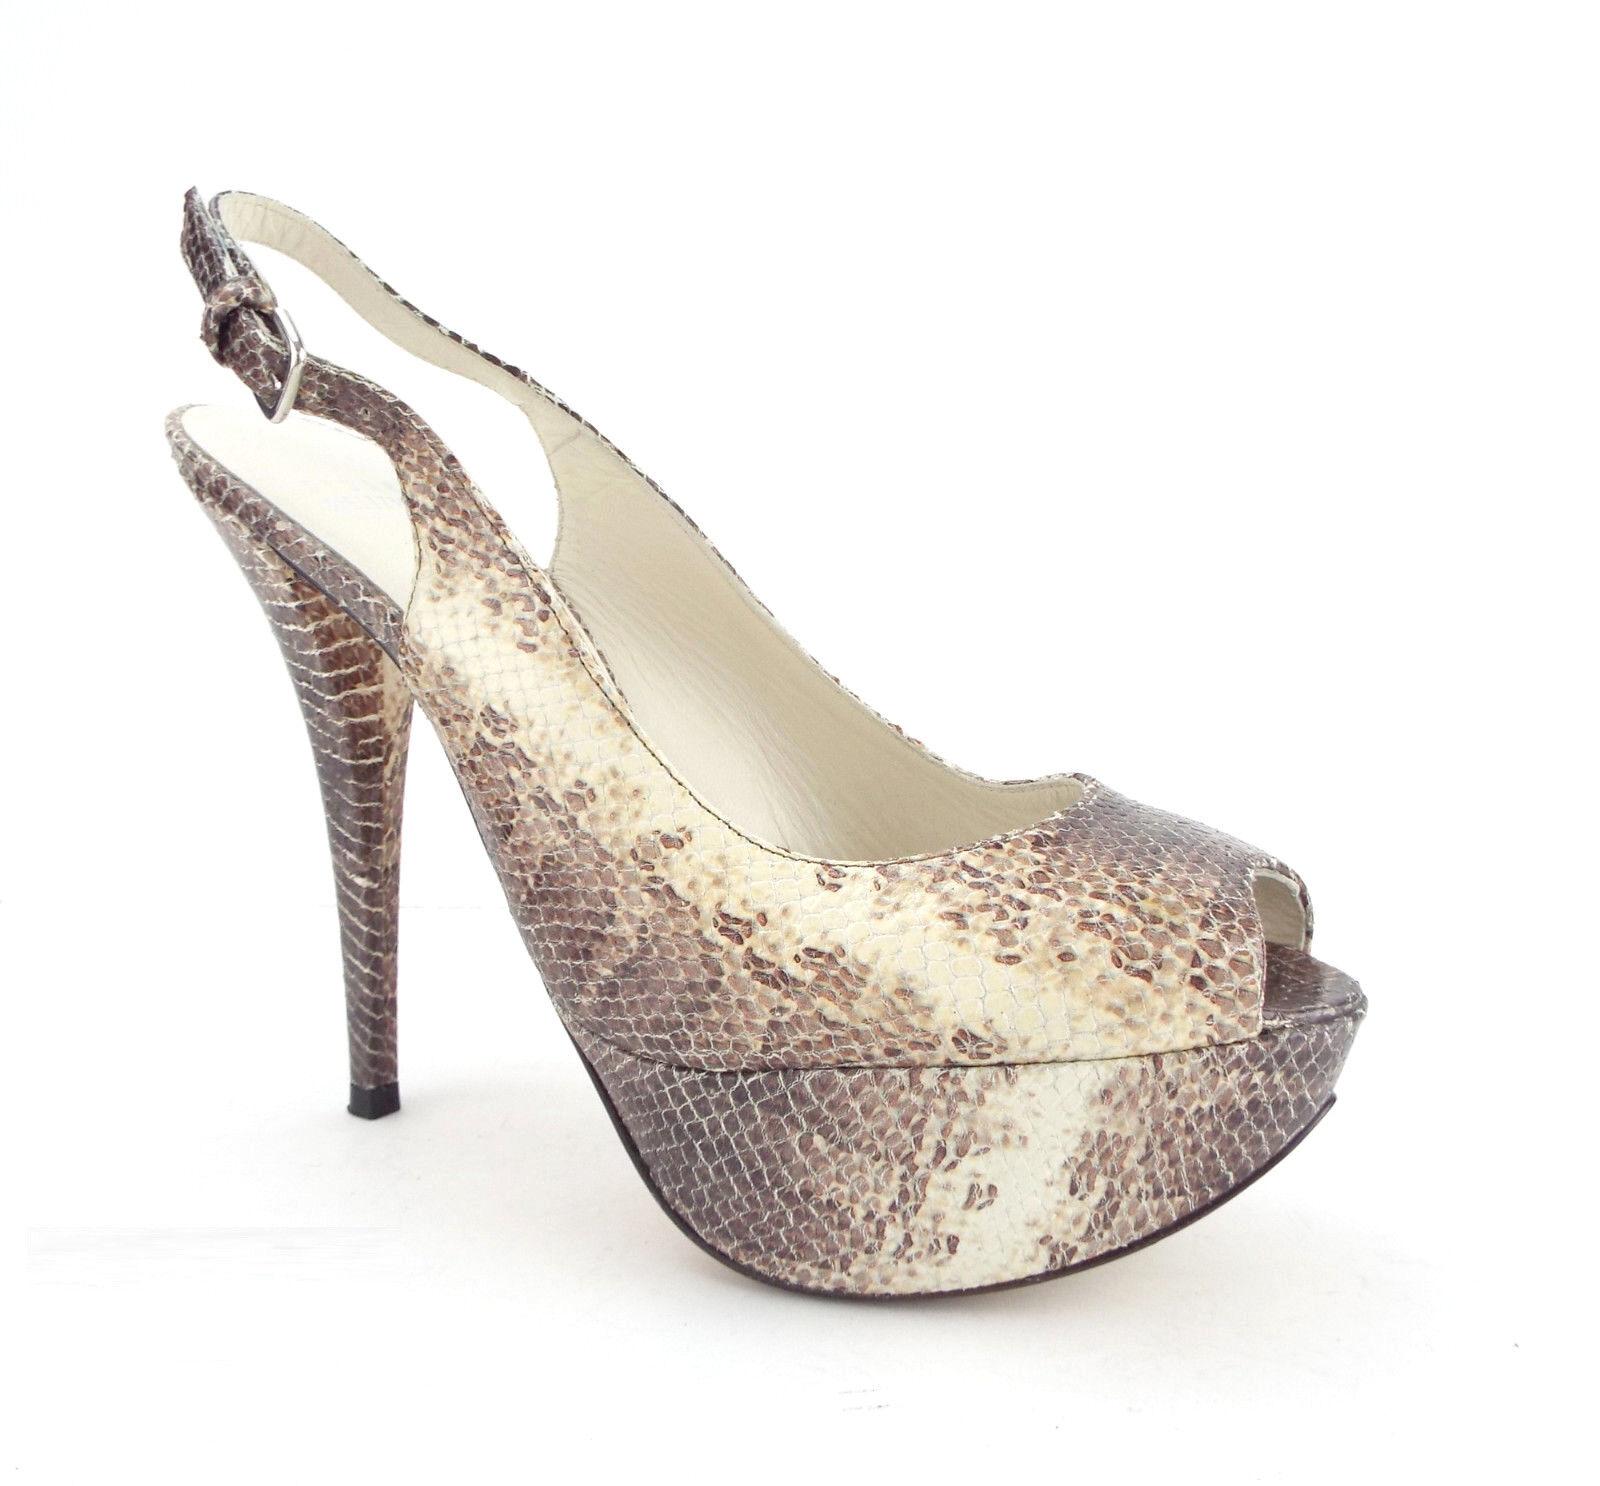 STUART WEITZMAN Size 8.5 VEVEY Snake Platform Slingback Heels Pumps Shoes 8 1/2